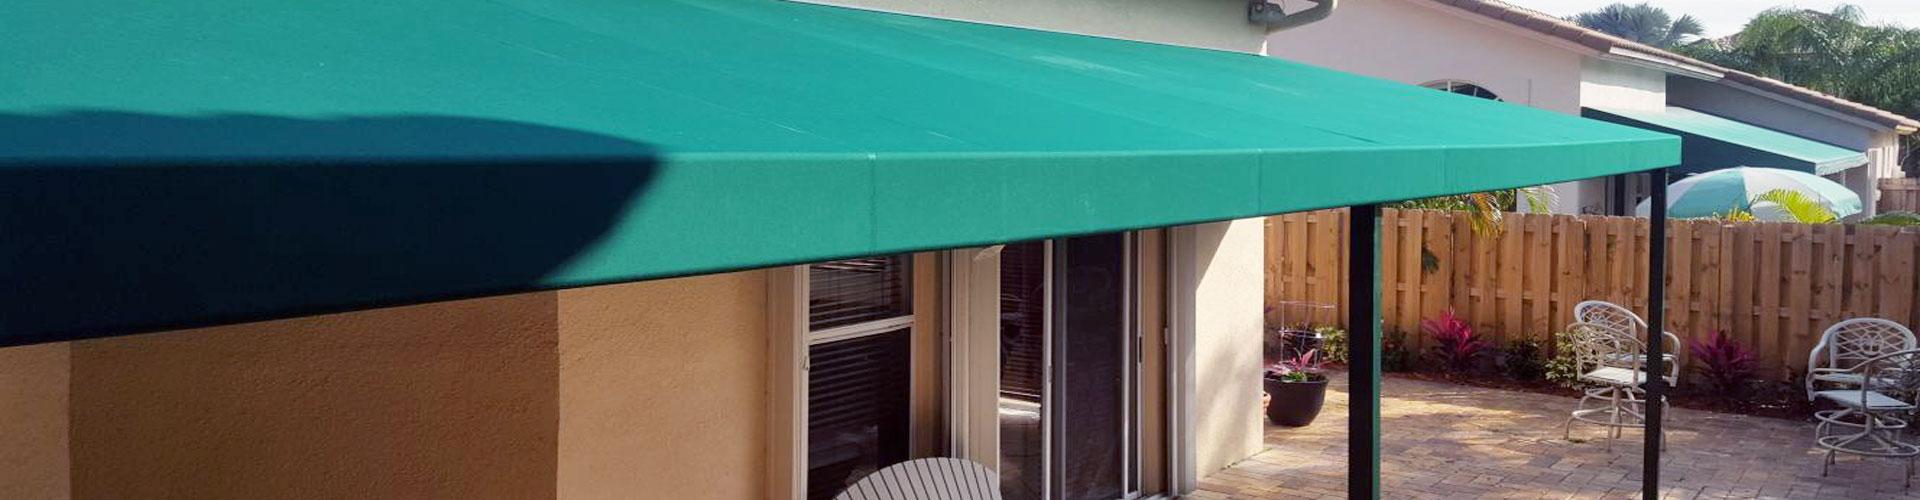 Affordable Awnings Miami: Toldos para Patios, Ventanas y Carports en Miami Patio Awnings, Windows & Carports